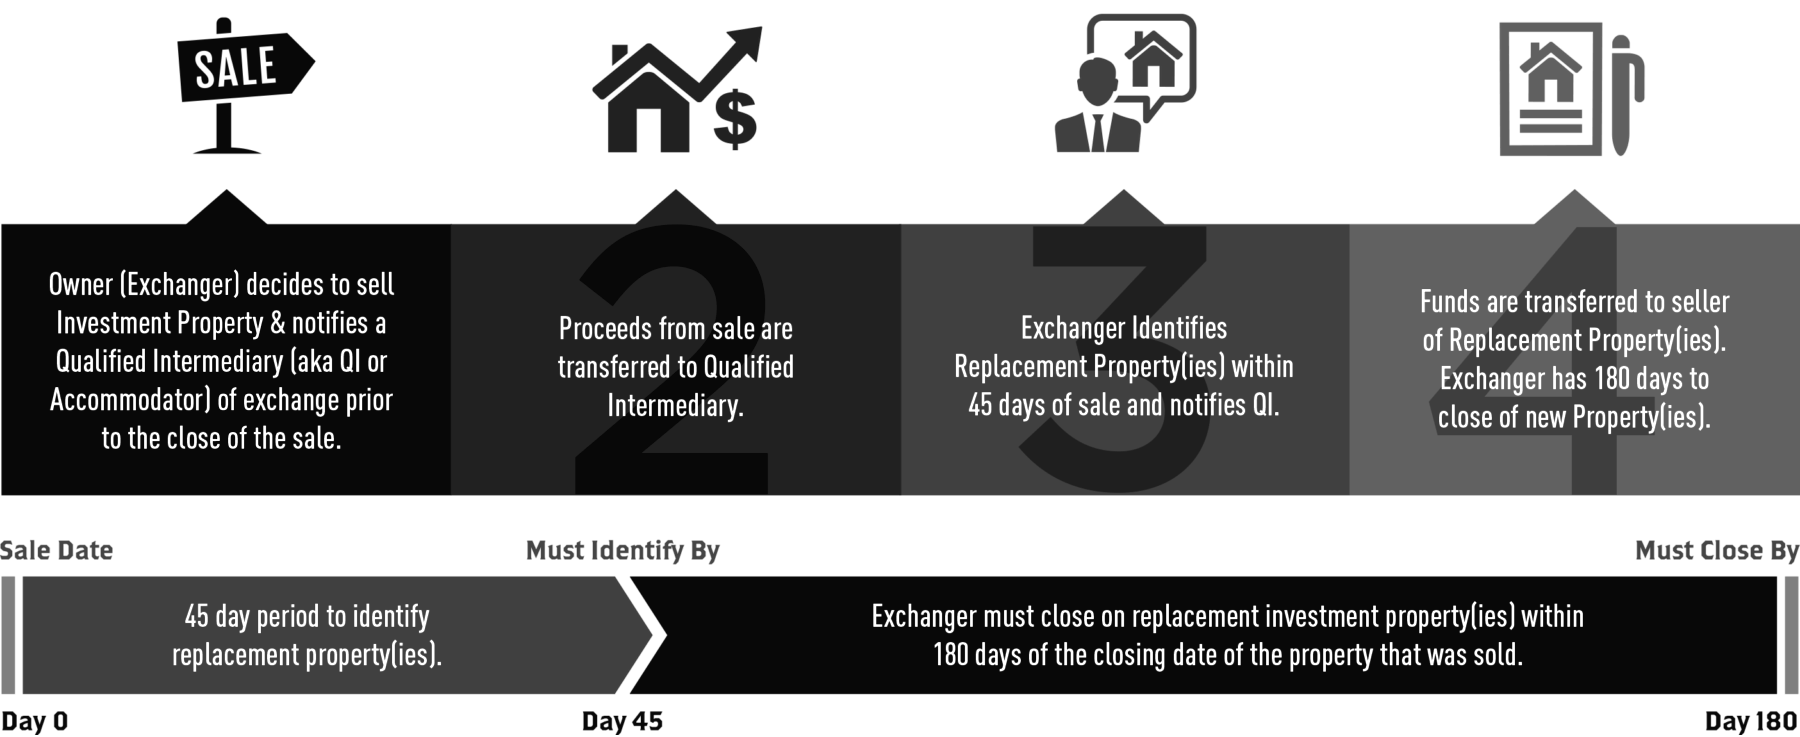 1031 Exchange Rules - tax deferred exchange